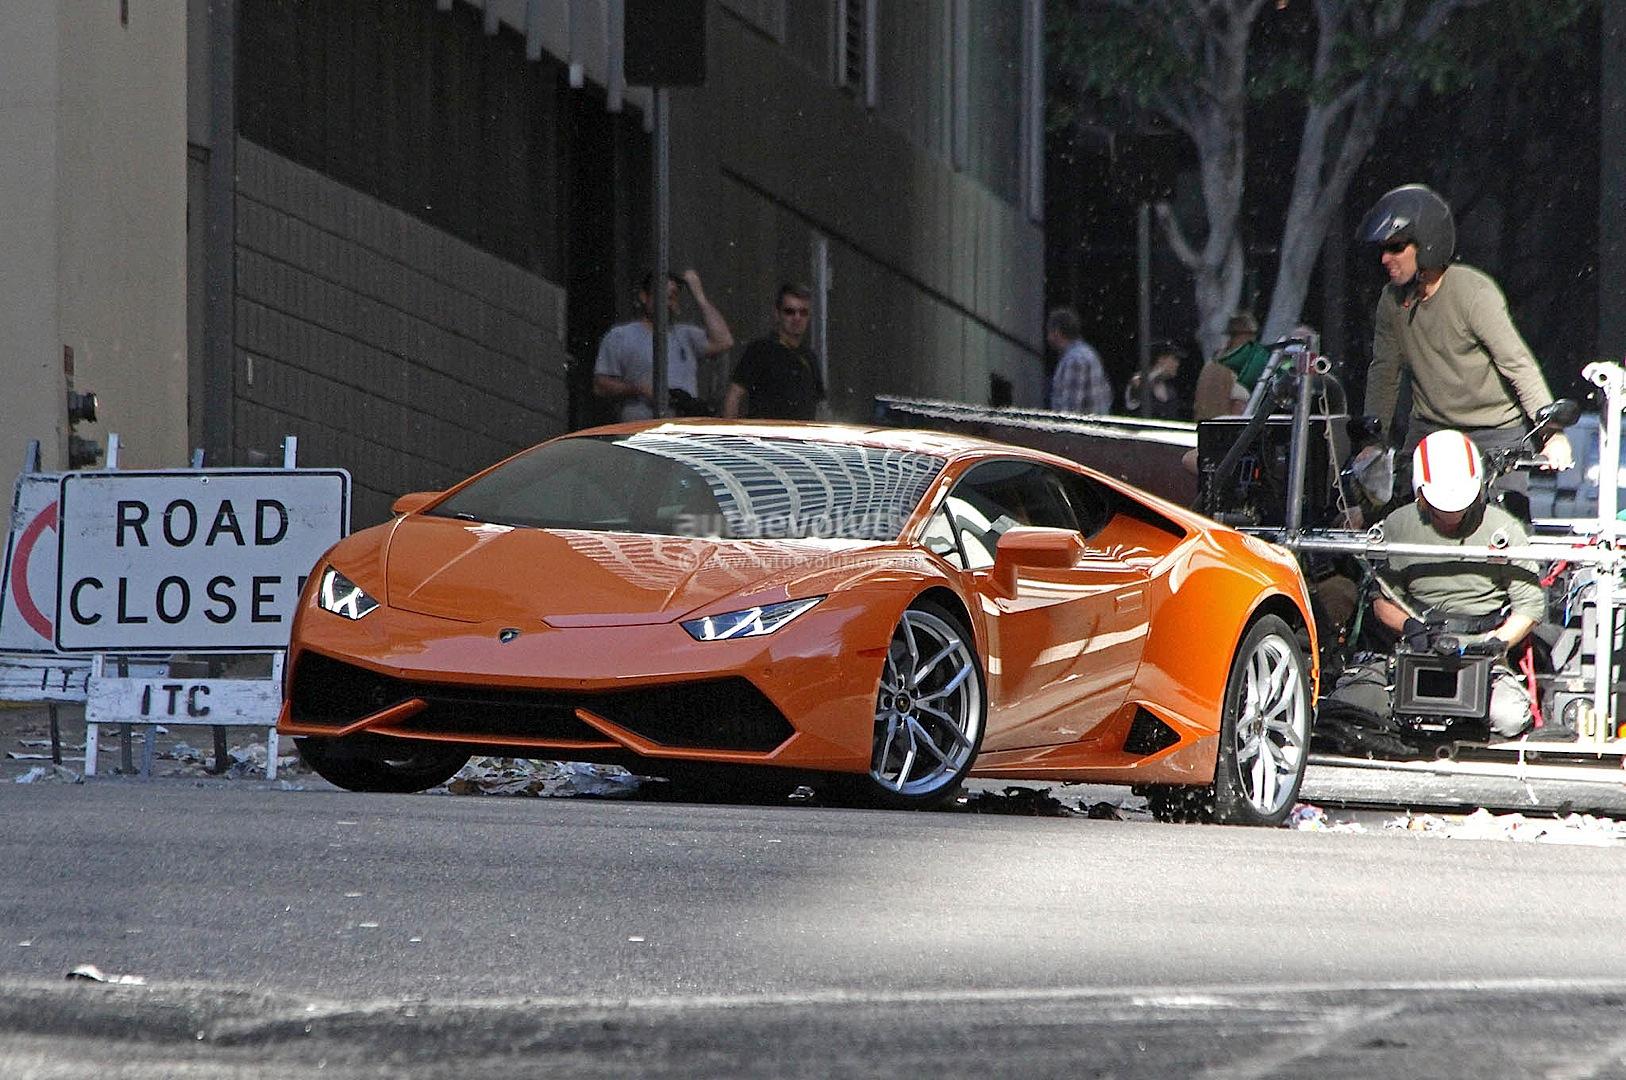 spyshots-orange-lamborghini-huracan-street-racing-in-the-us_10.jpg?1390936746